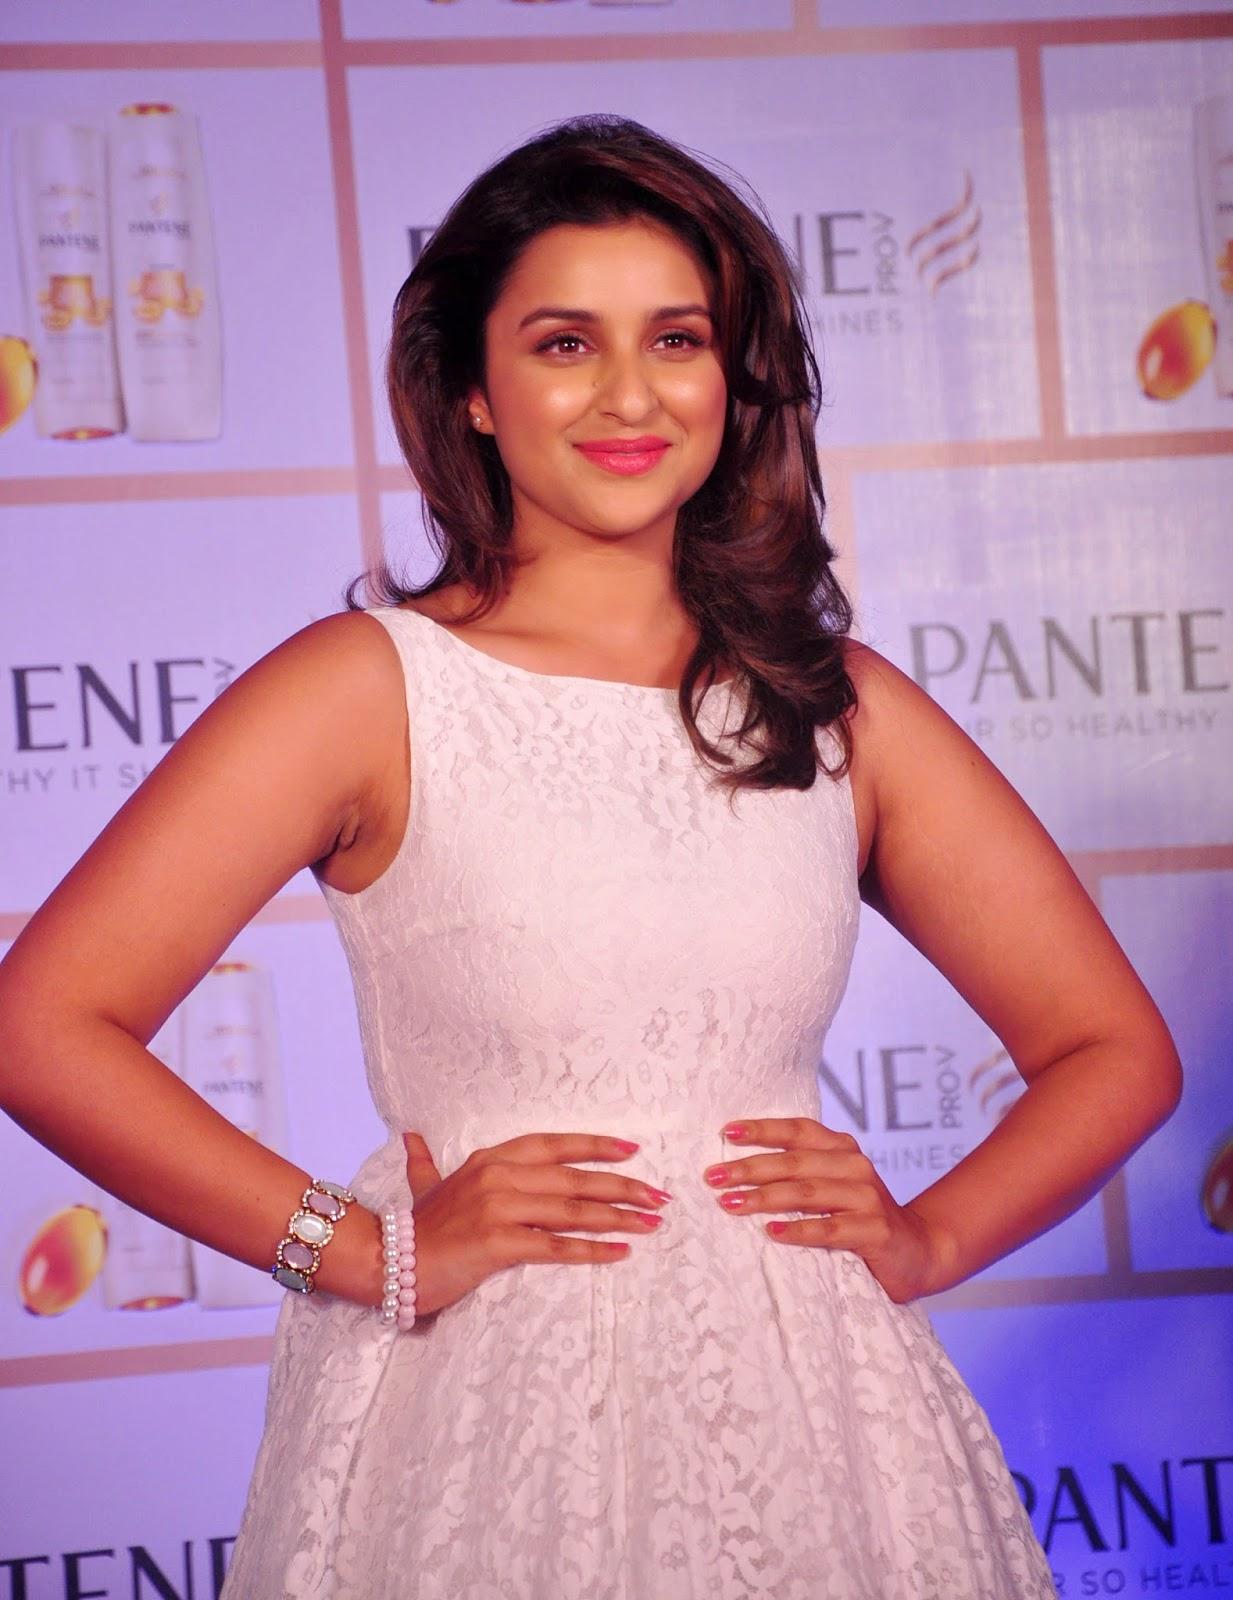 Parineeti Chopra Looks Sexy In White Dress At Pantene Proof Over Promises Campaign Launch In Mumbai